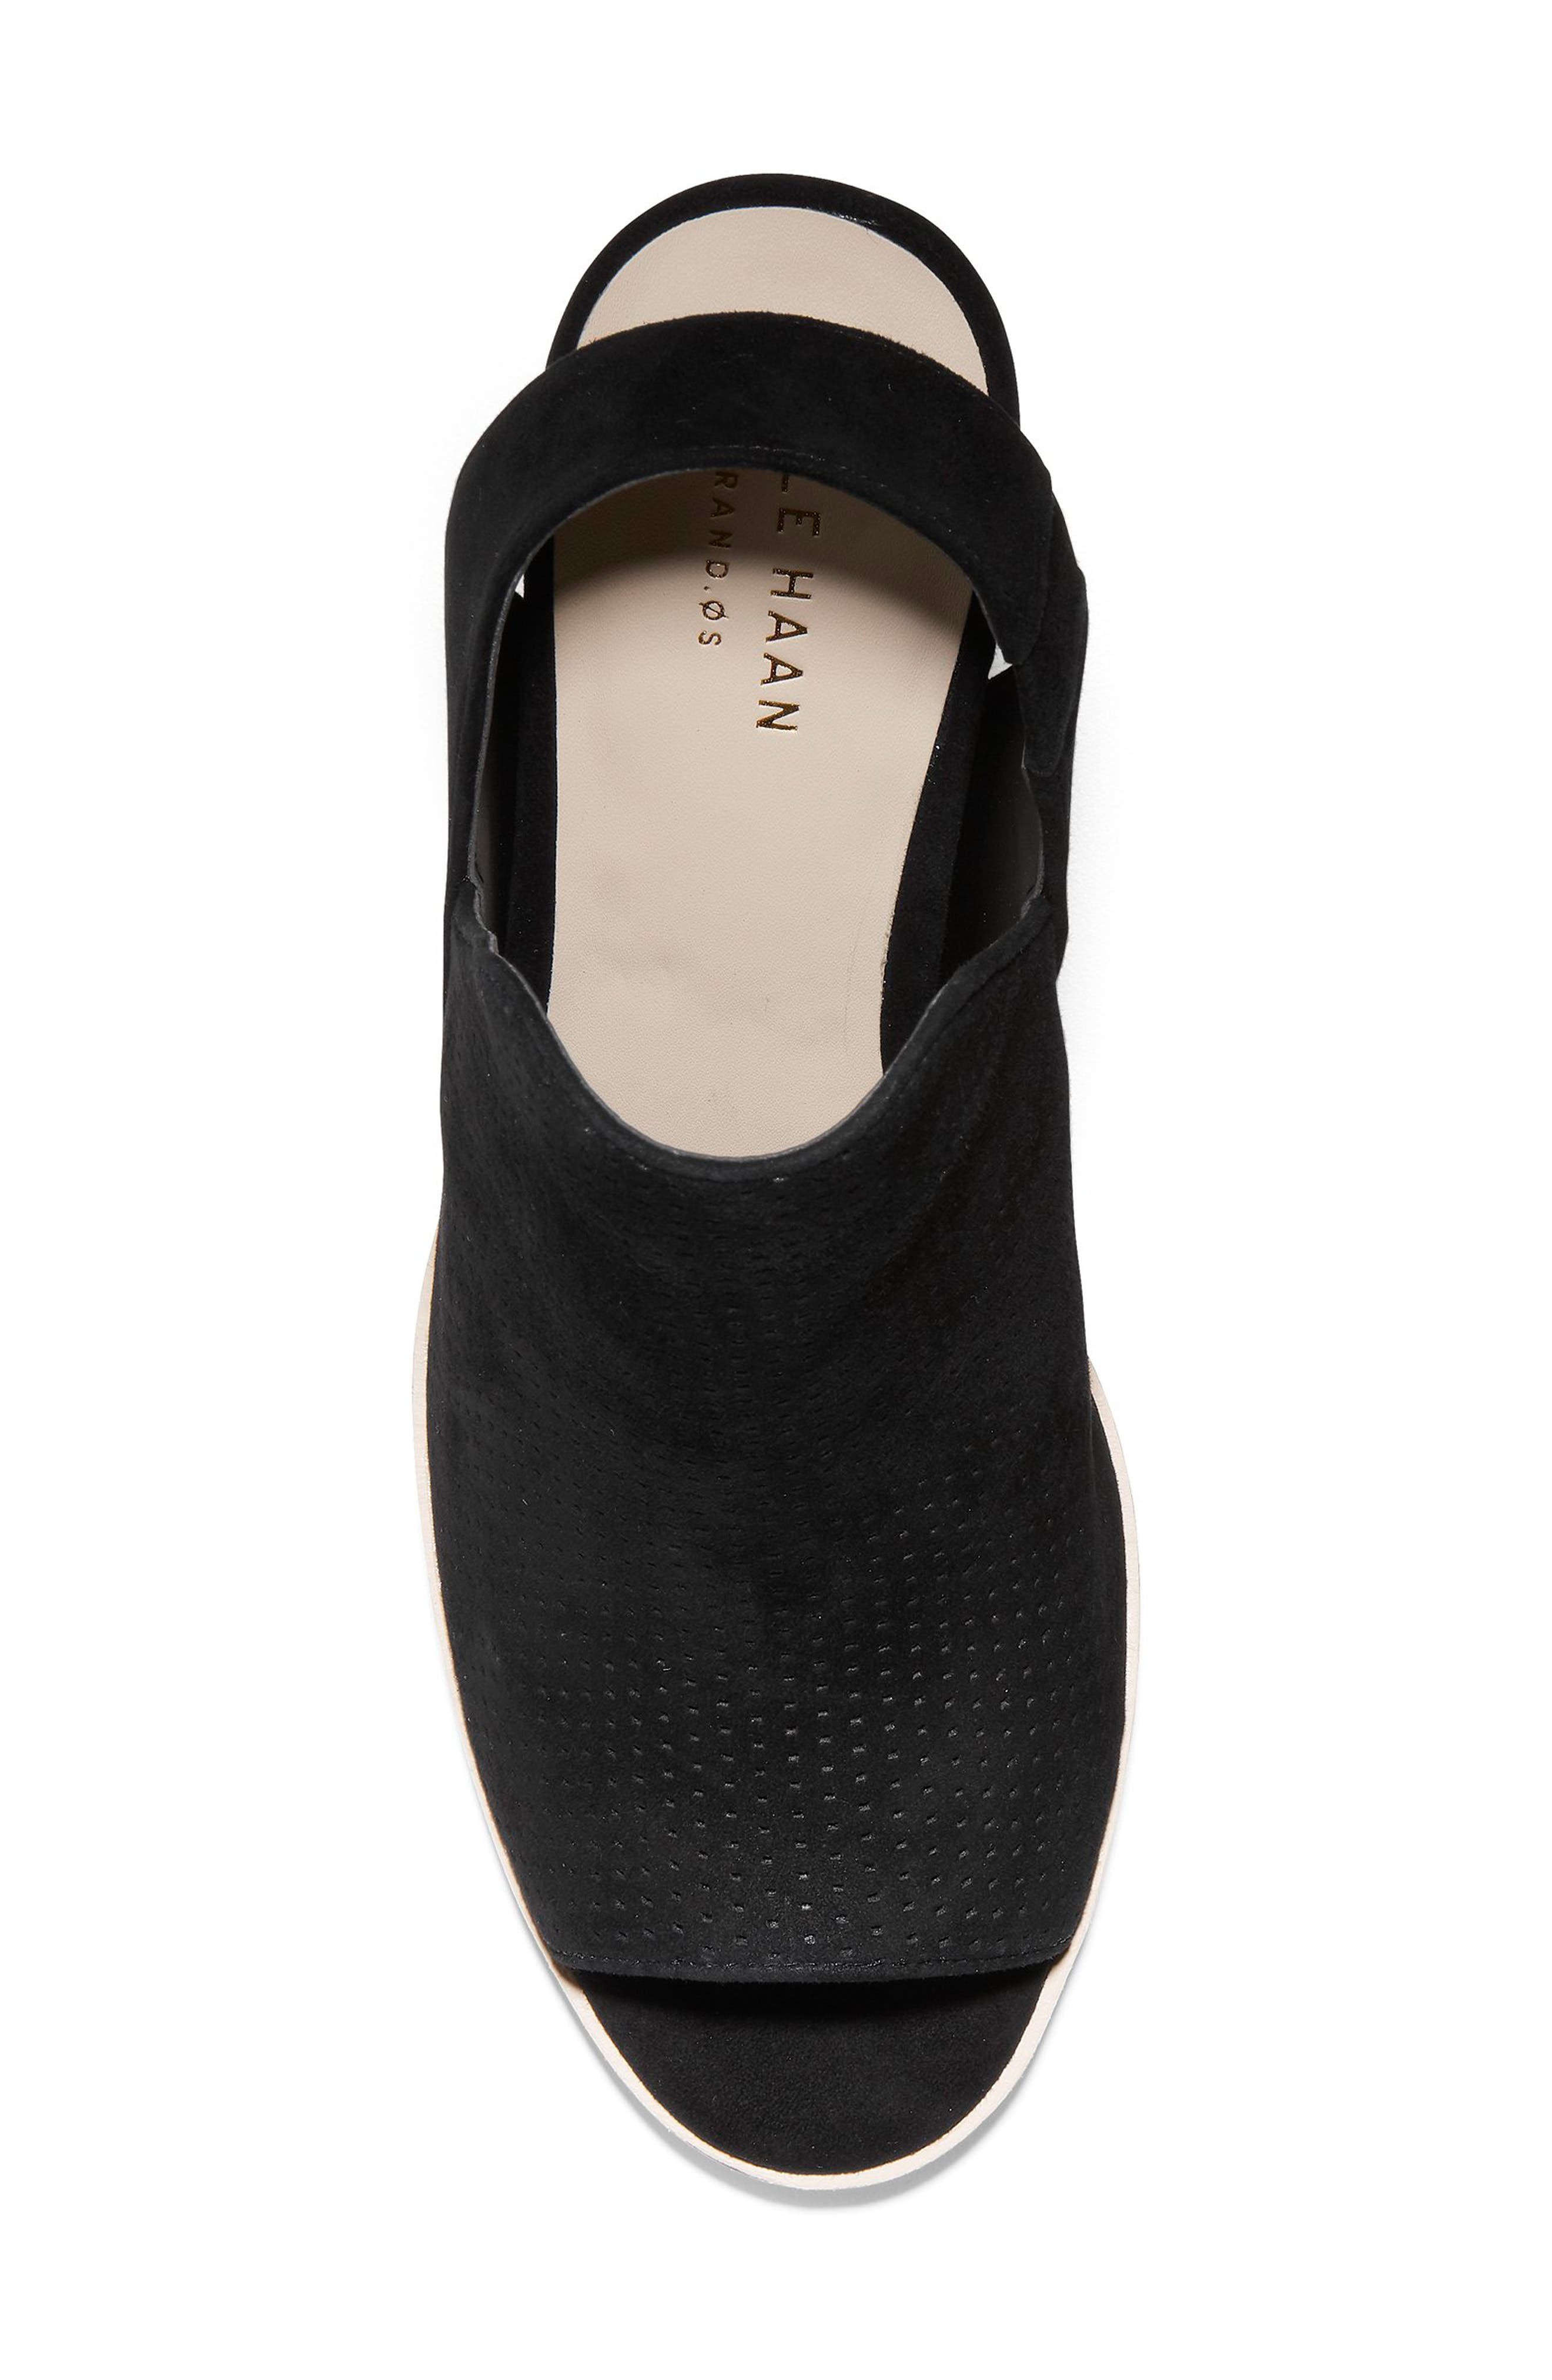 Callista Perforated Slingback Sandal,                             Alternate thumbnail 5, color,                             BLACK PERF SUEDE